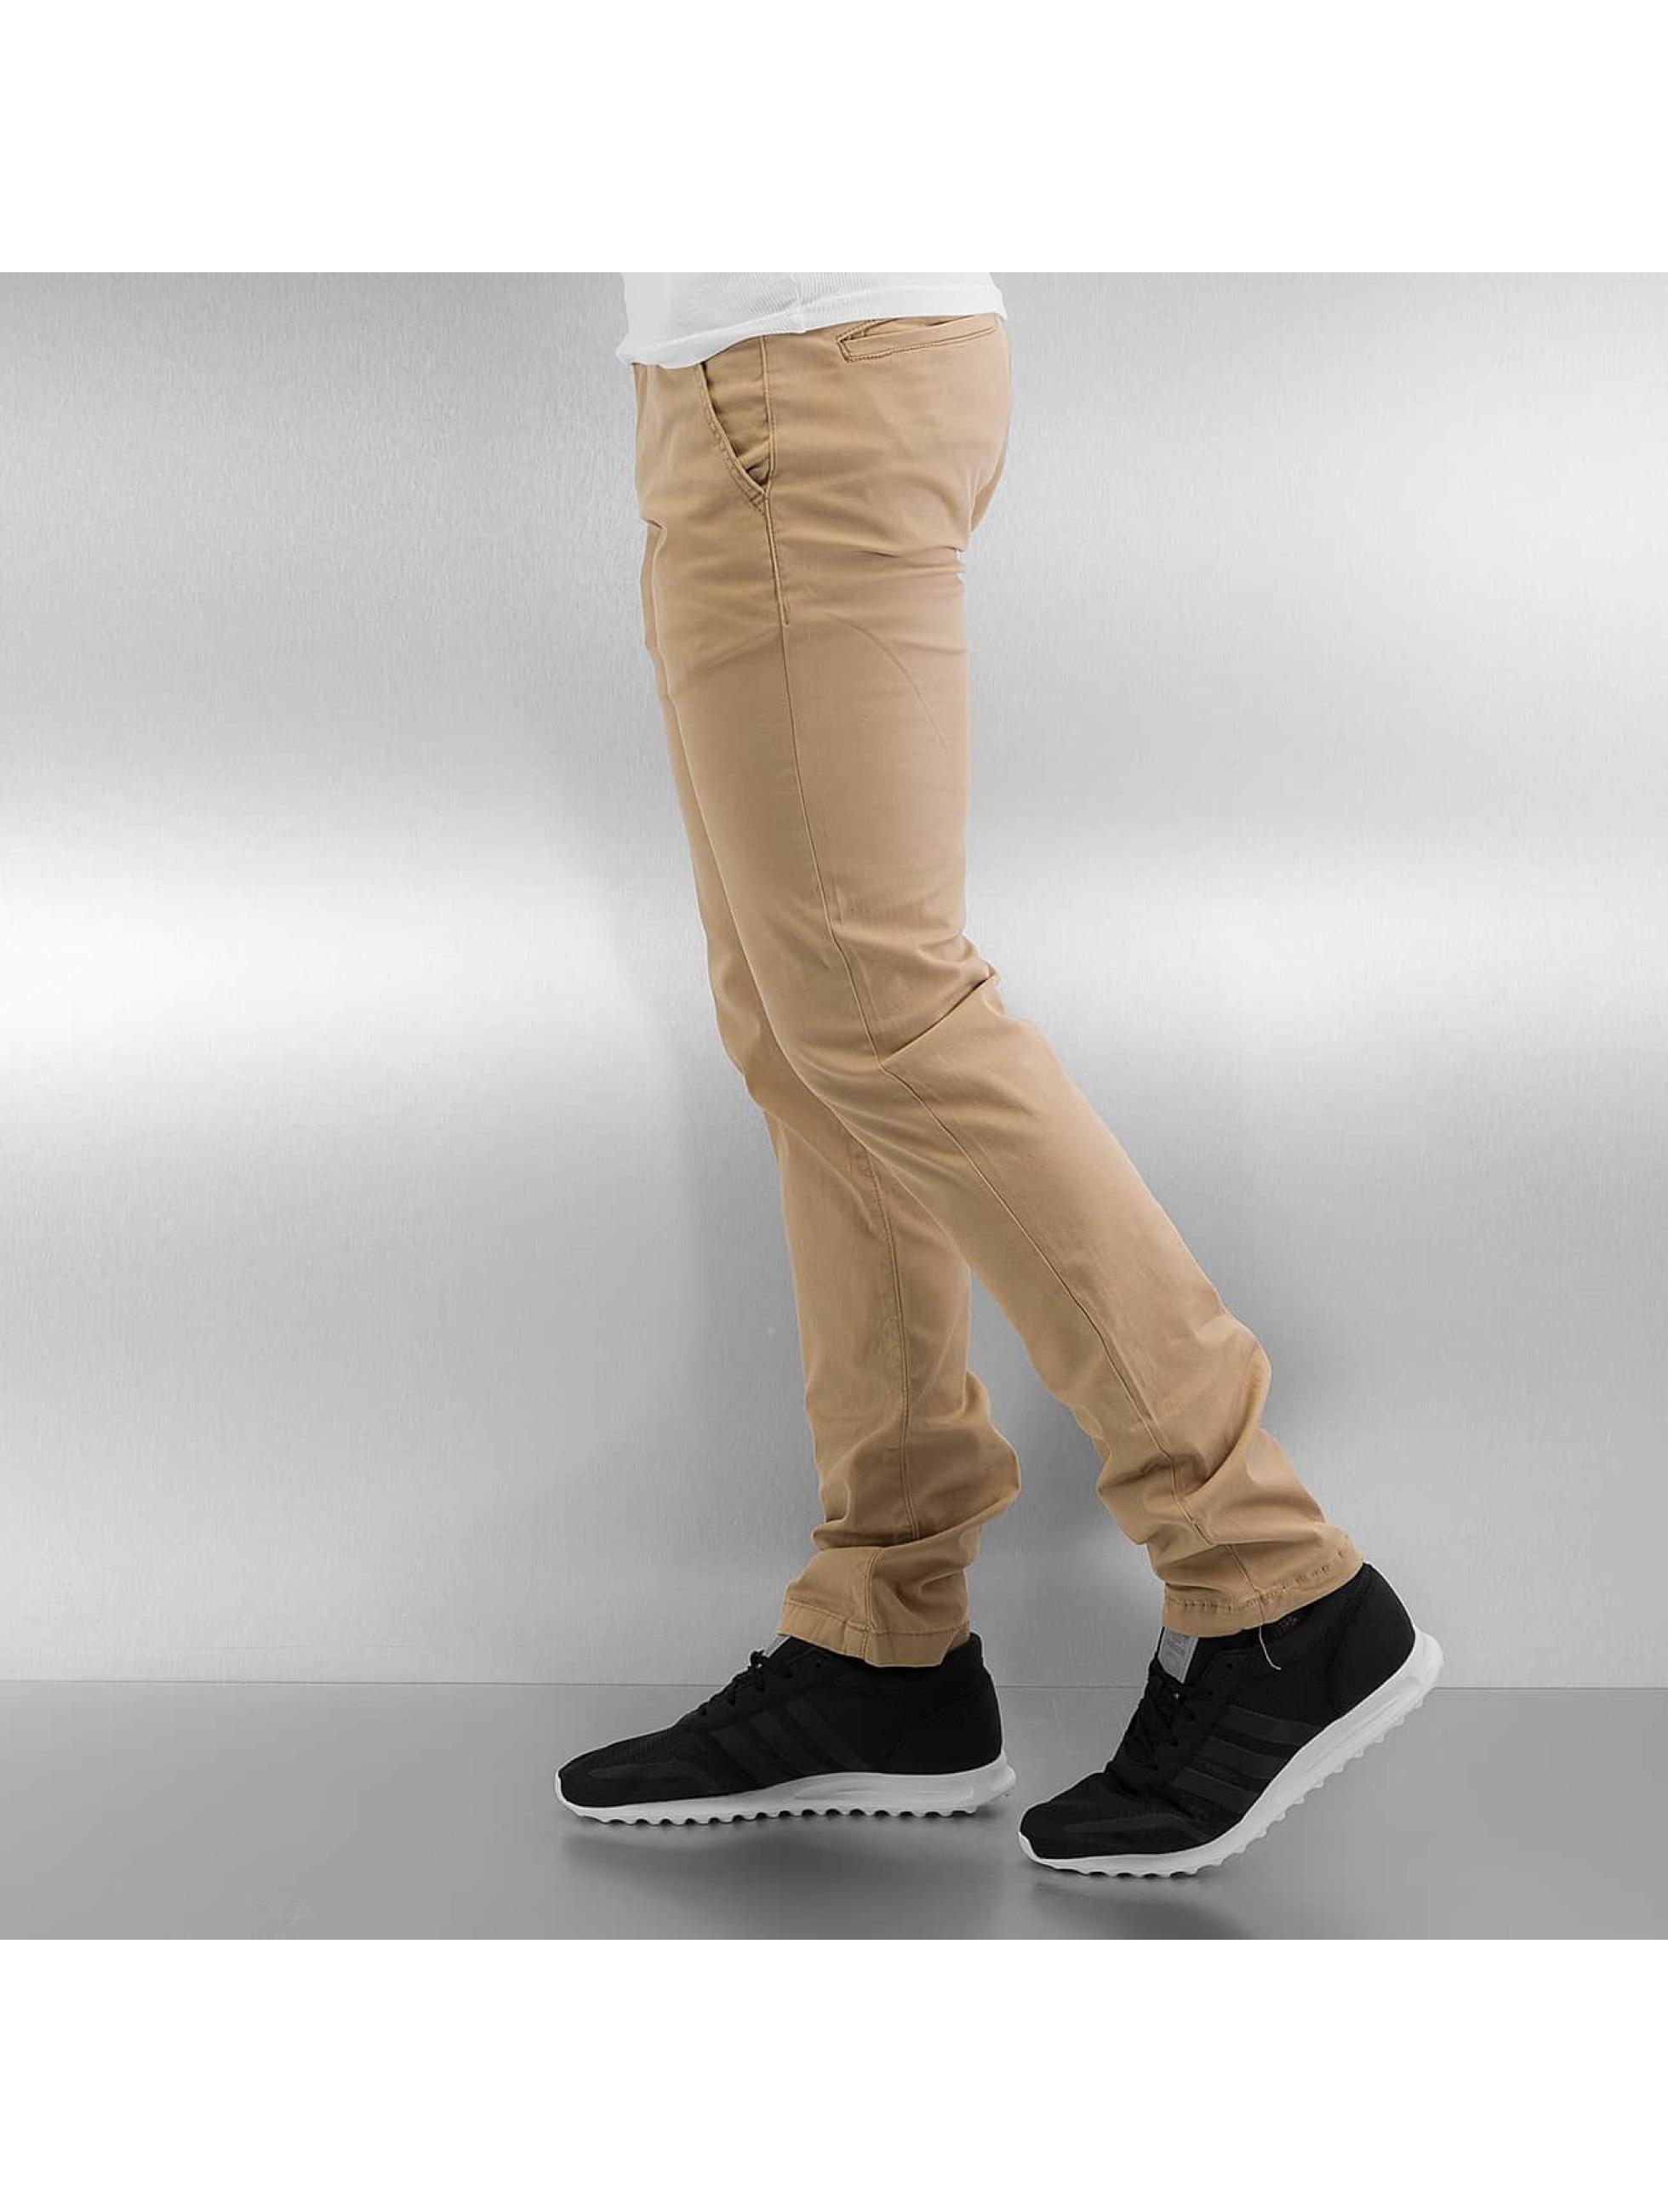 SHINE Original Pantalon chino Stretch beige